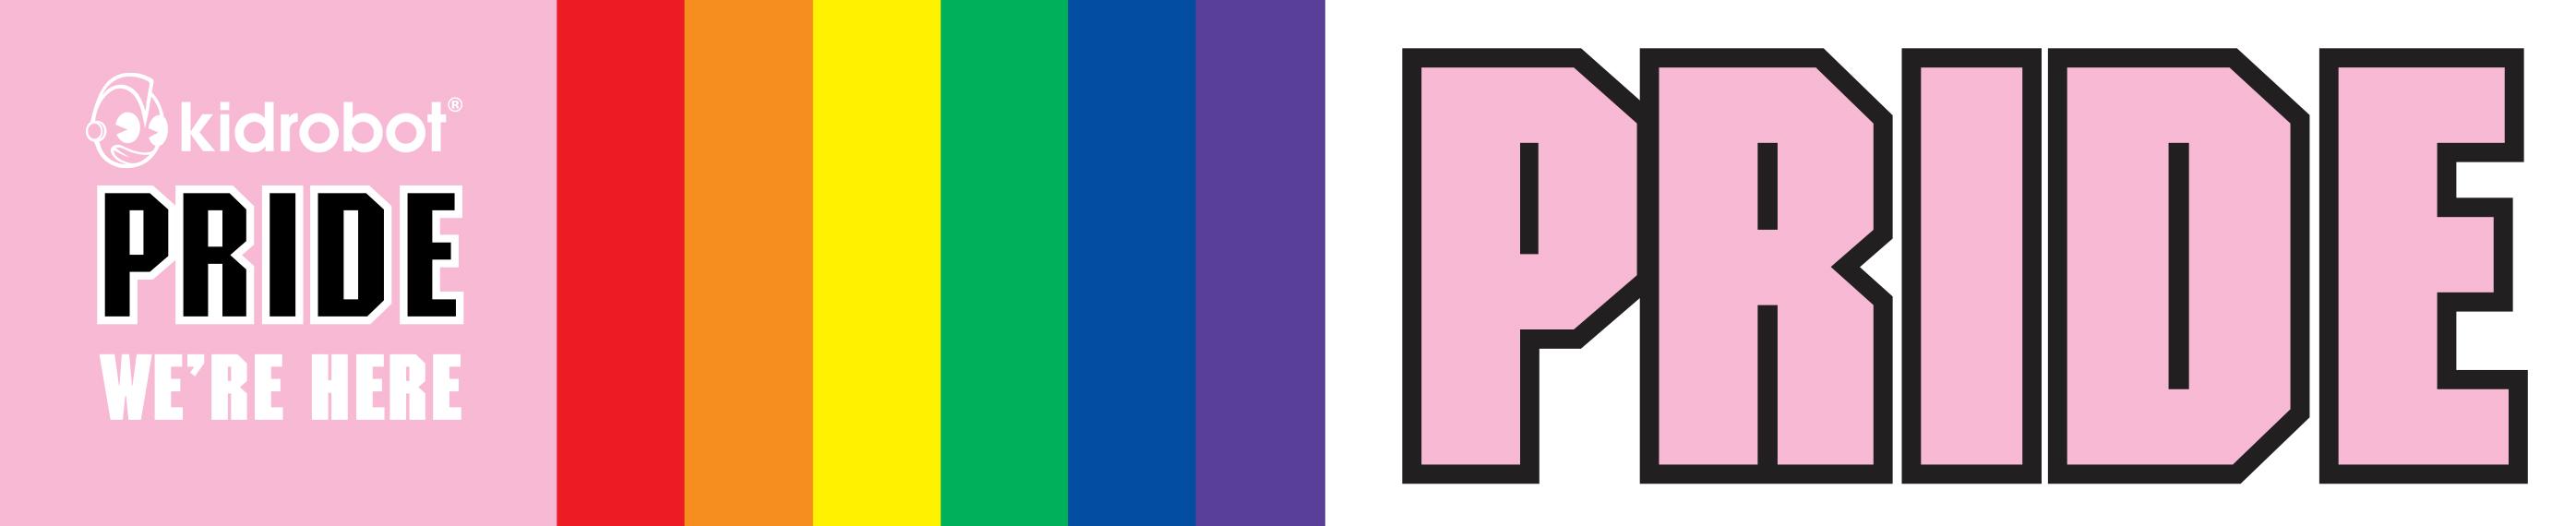 Kidrobot LGBTQ Pride Art Toys by Kidrobot